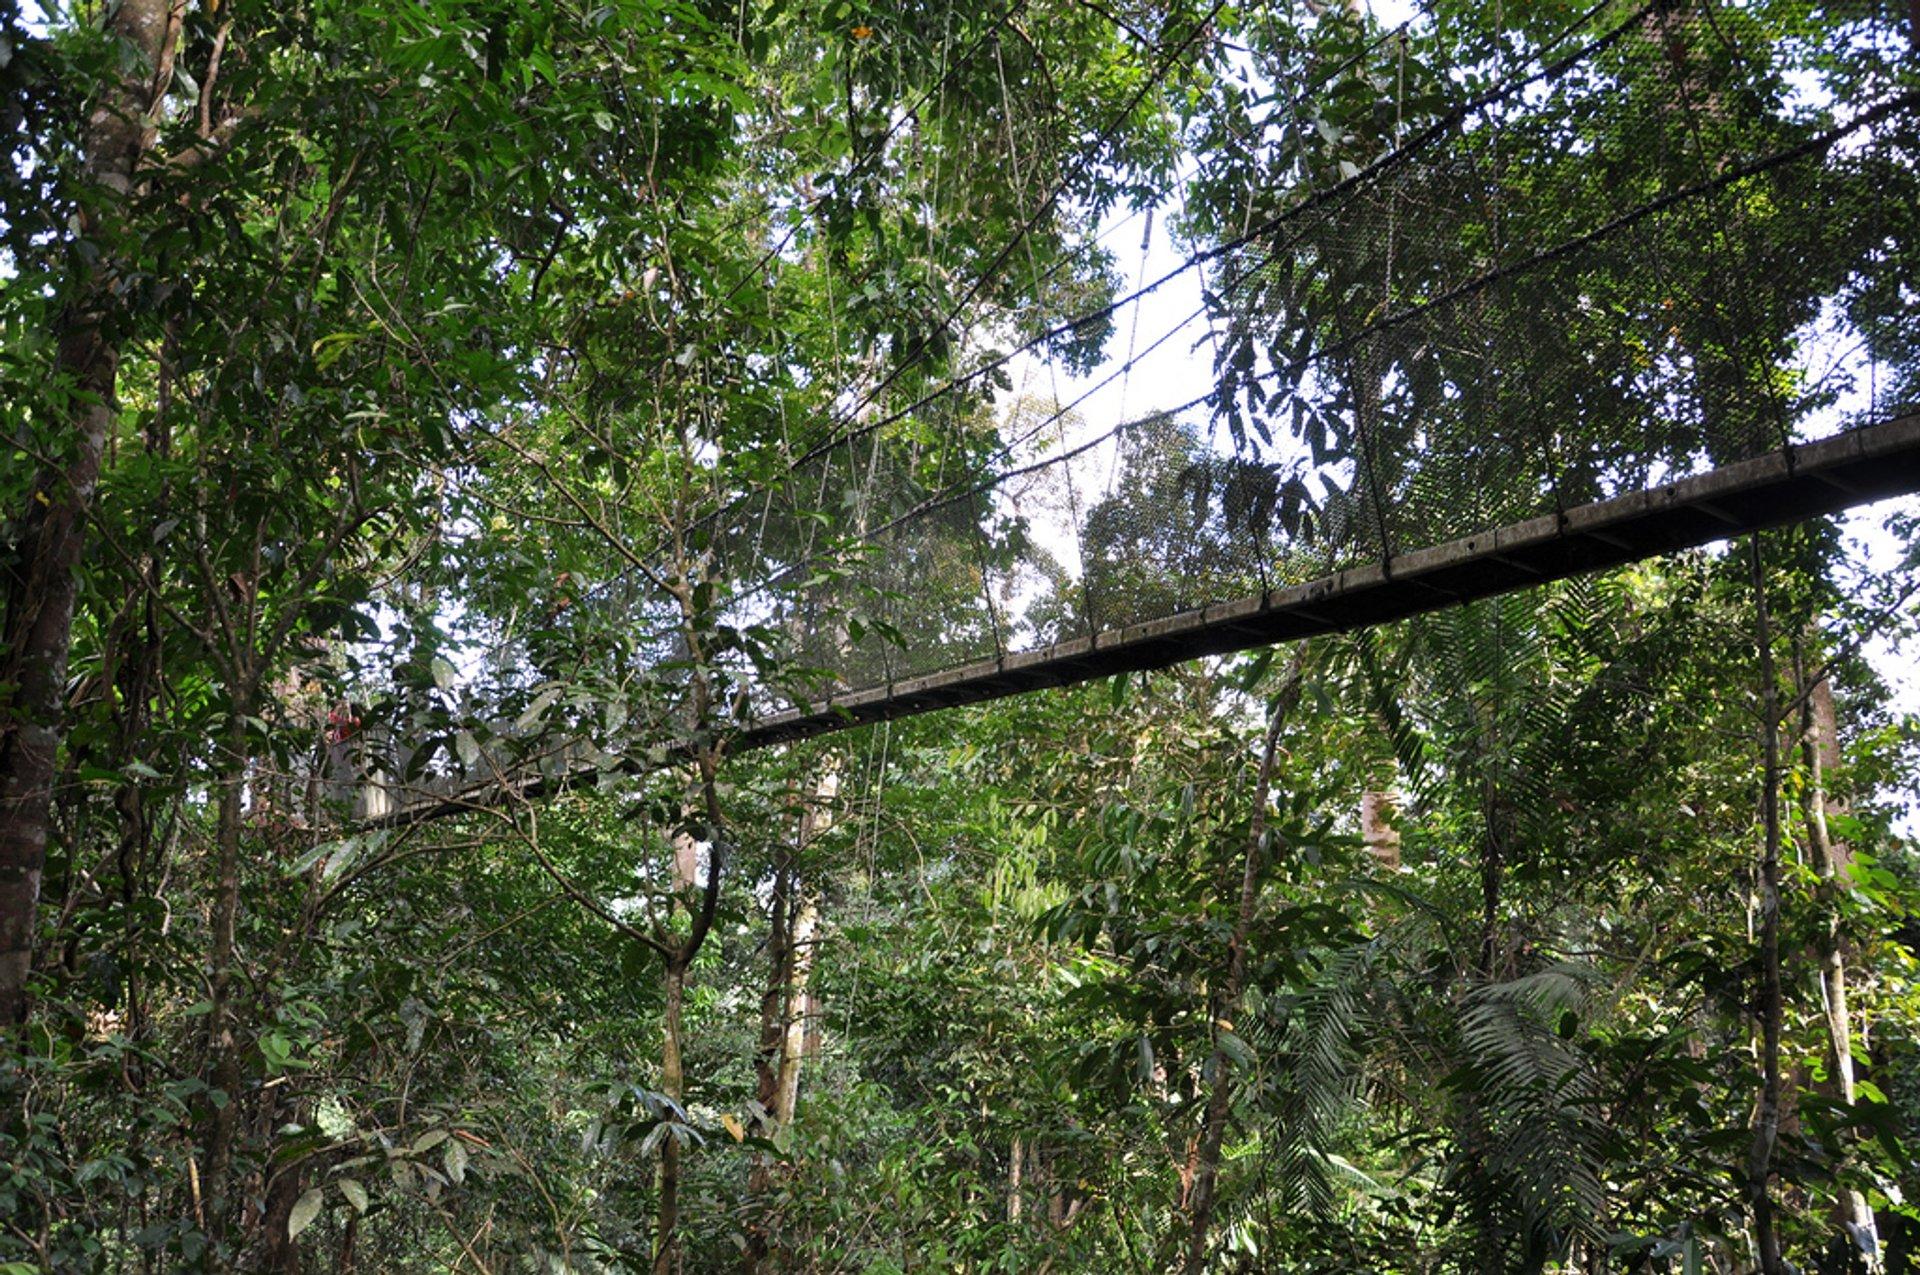 Parting shot of the rope bridge in Kota Kinabalu 2020